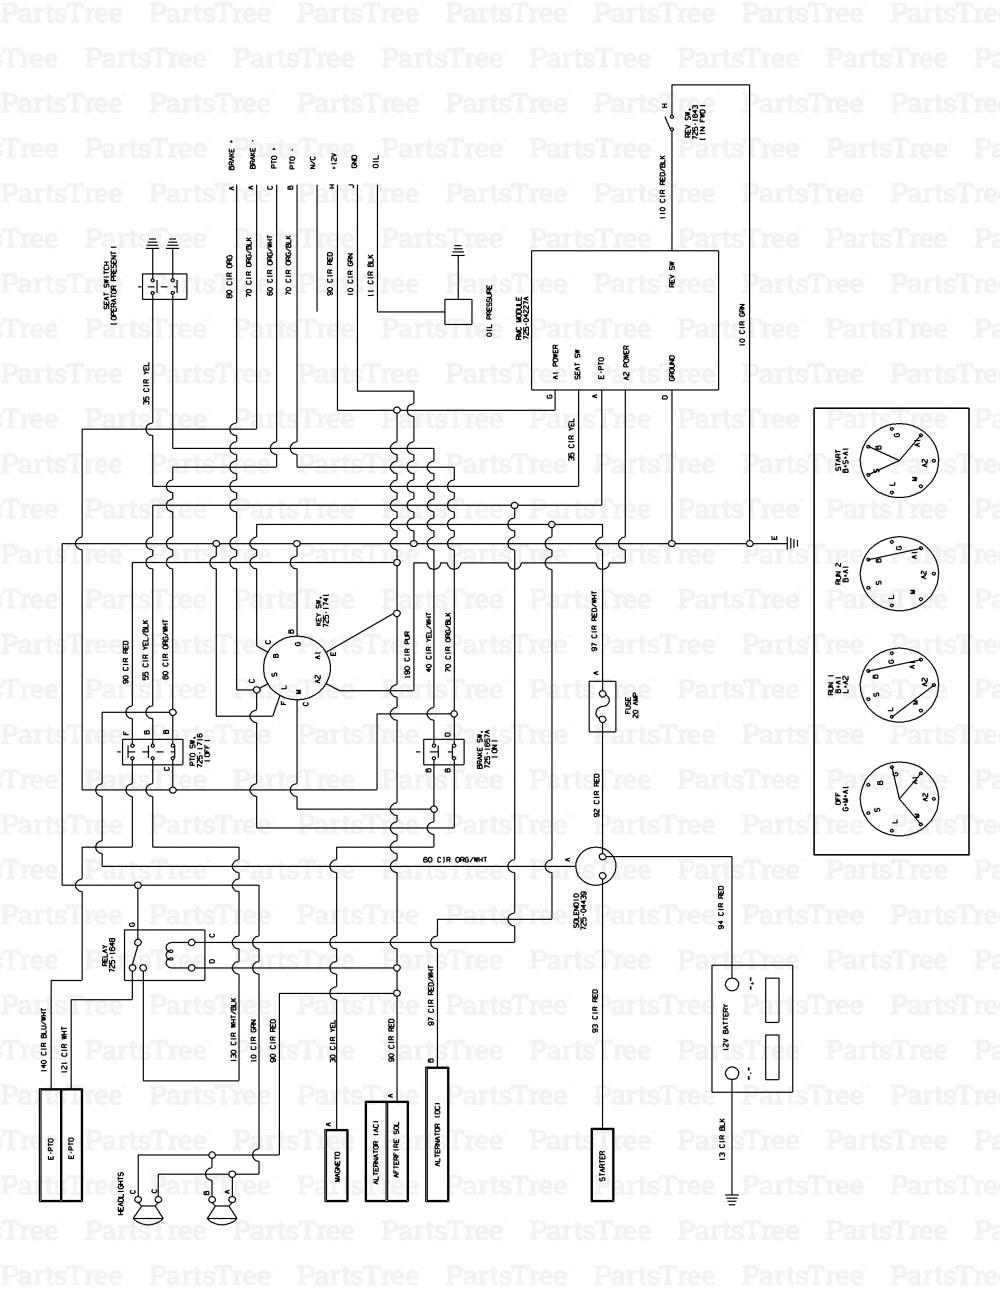 Cub Cadet 107 Wiring Diagram - Wiring Diagrams on